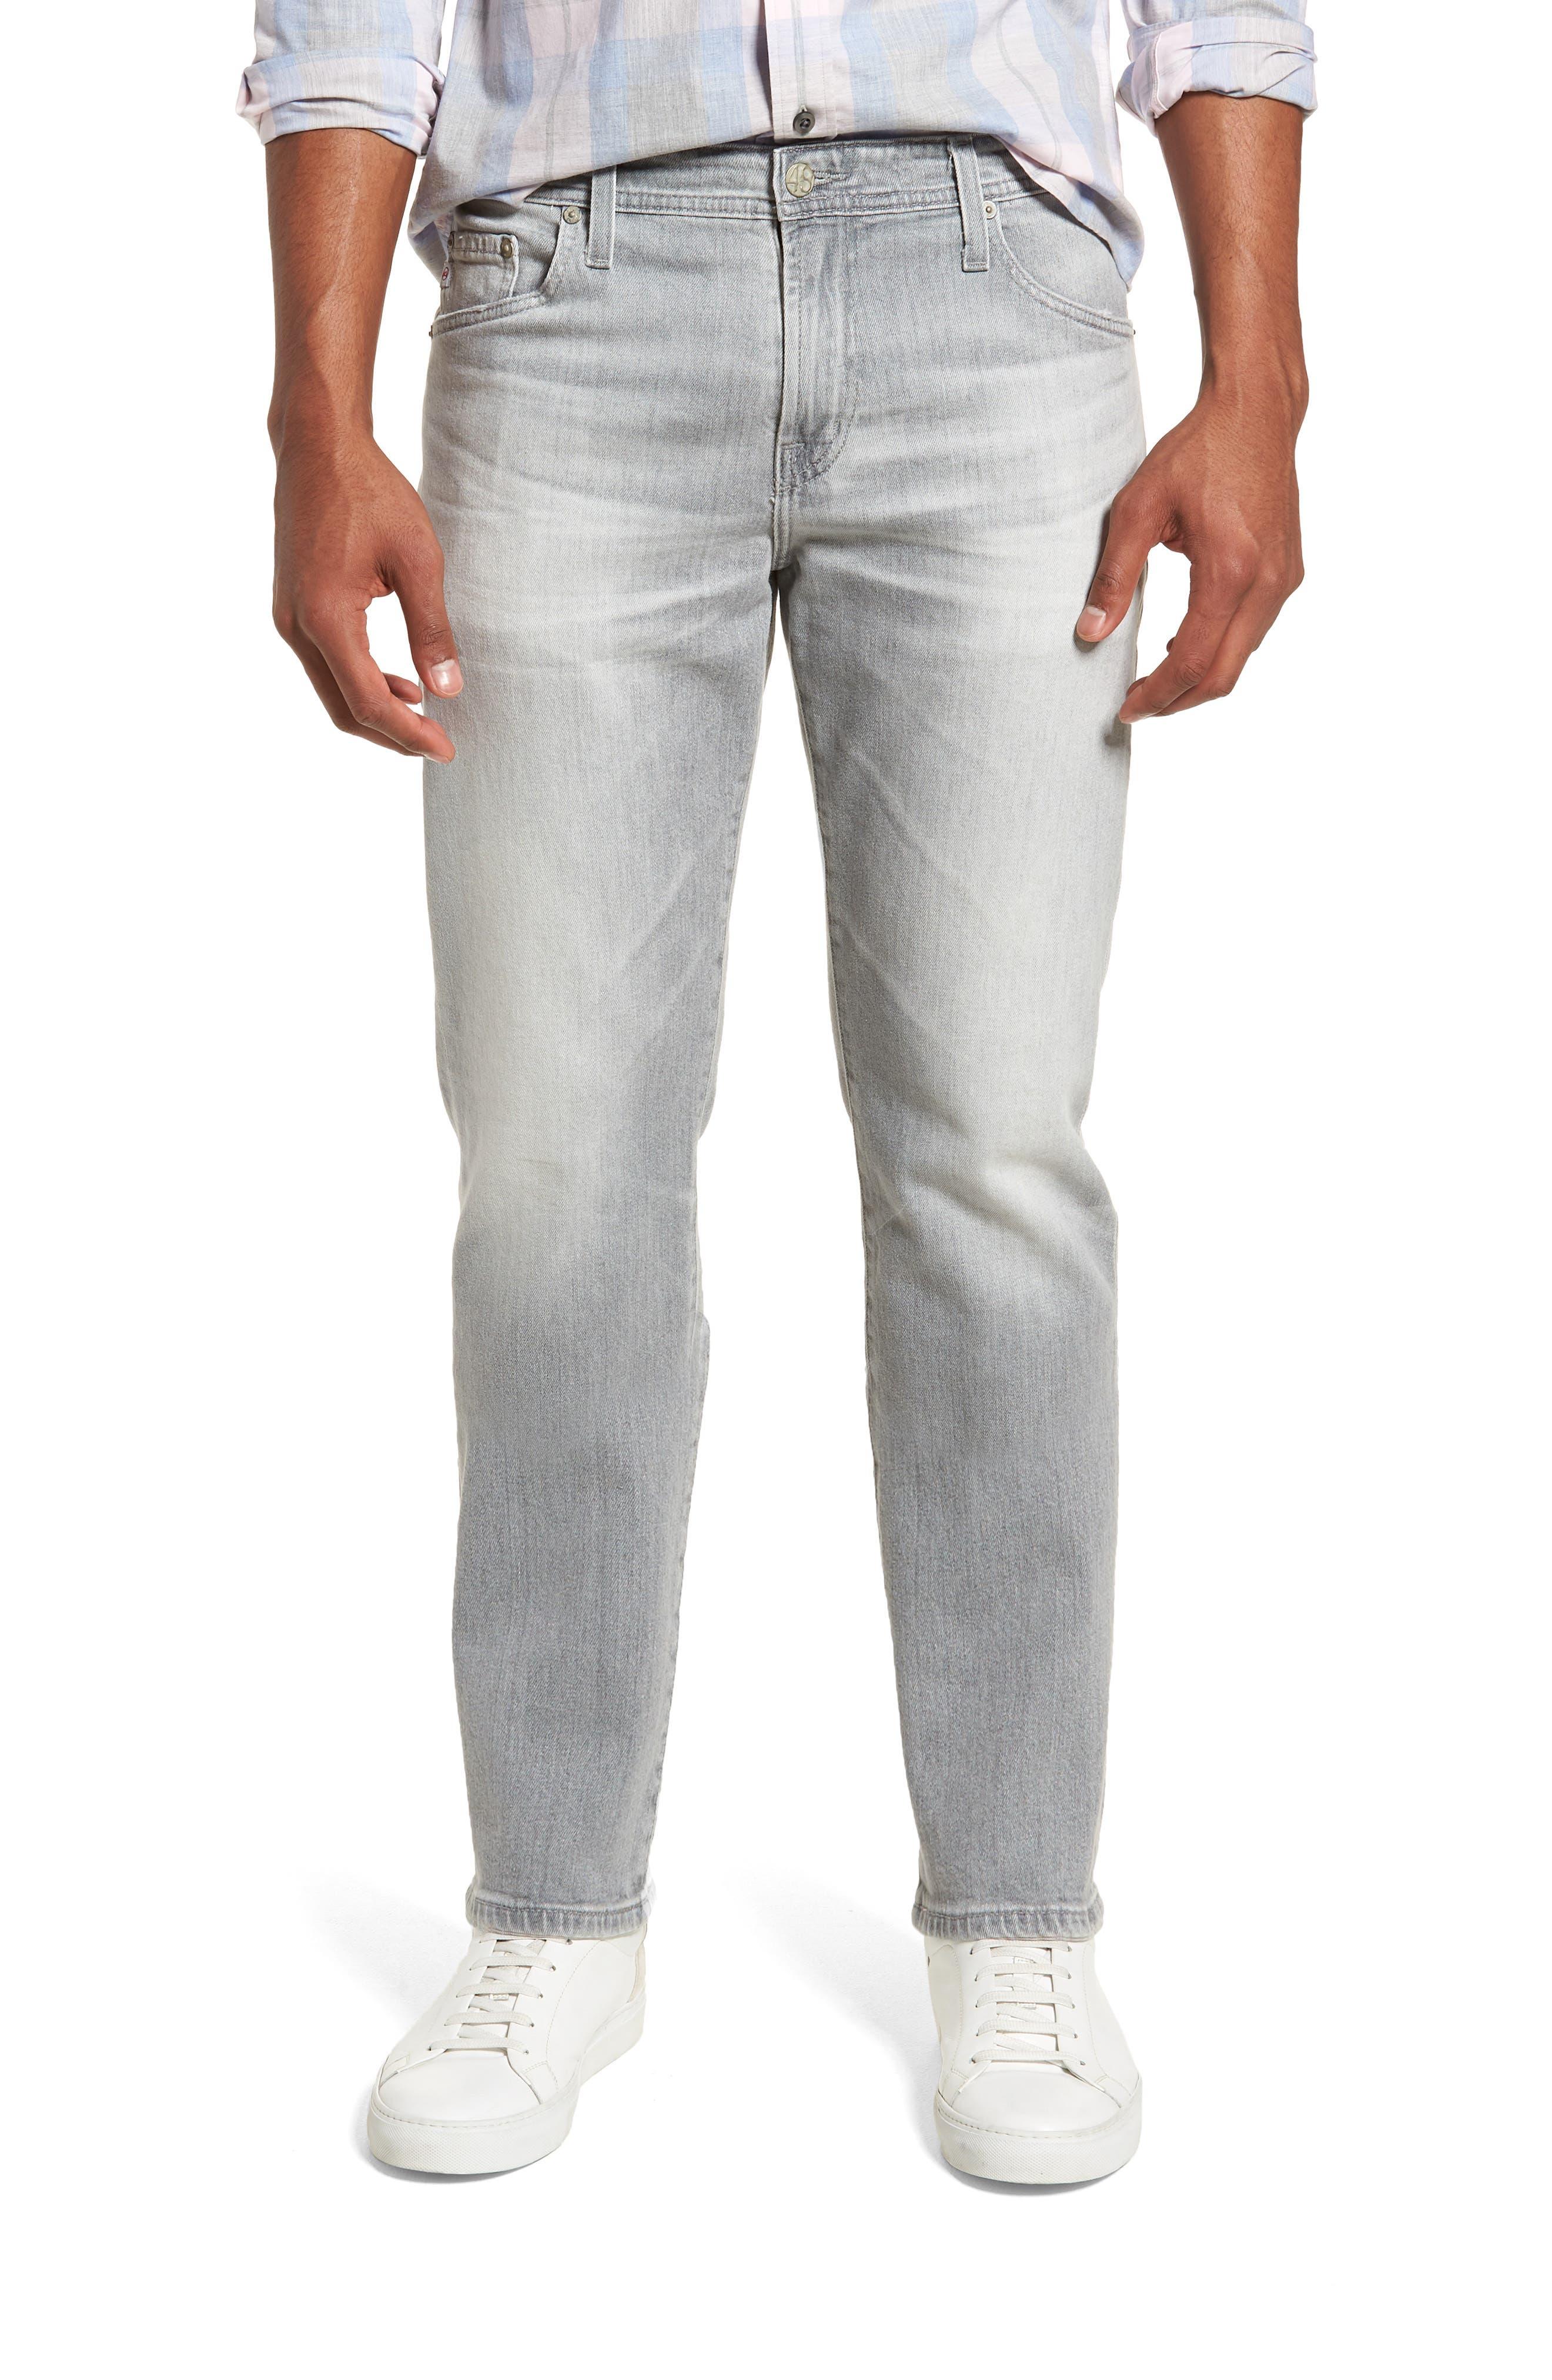 Graduate Slim Straight Leg Jeans,                         Main,                         color, 21 Years Outline